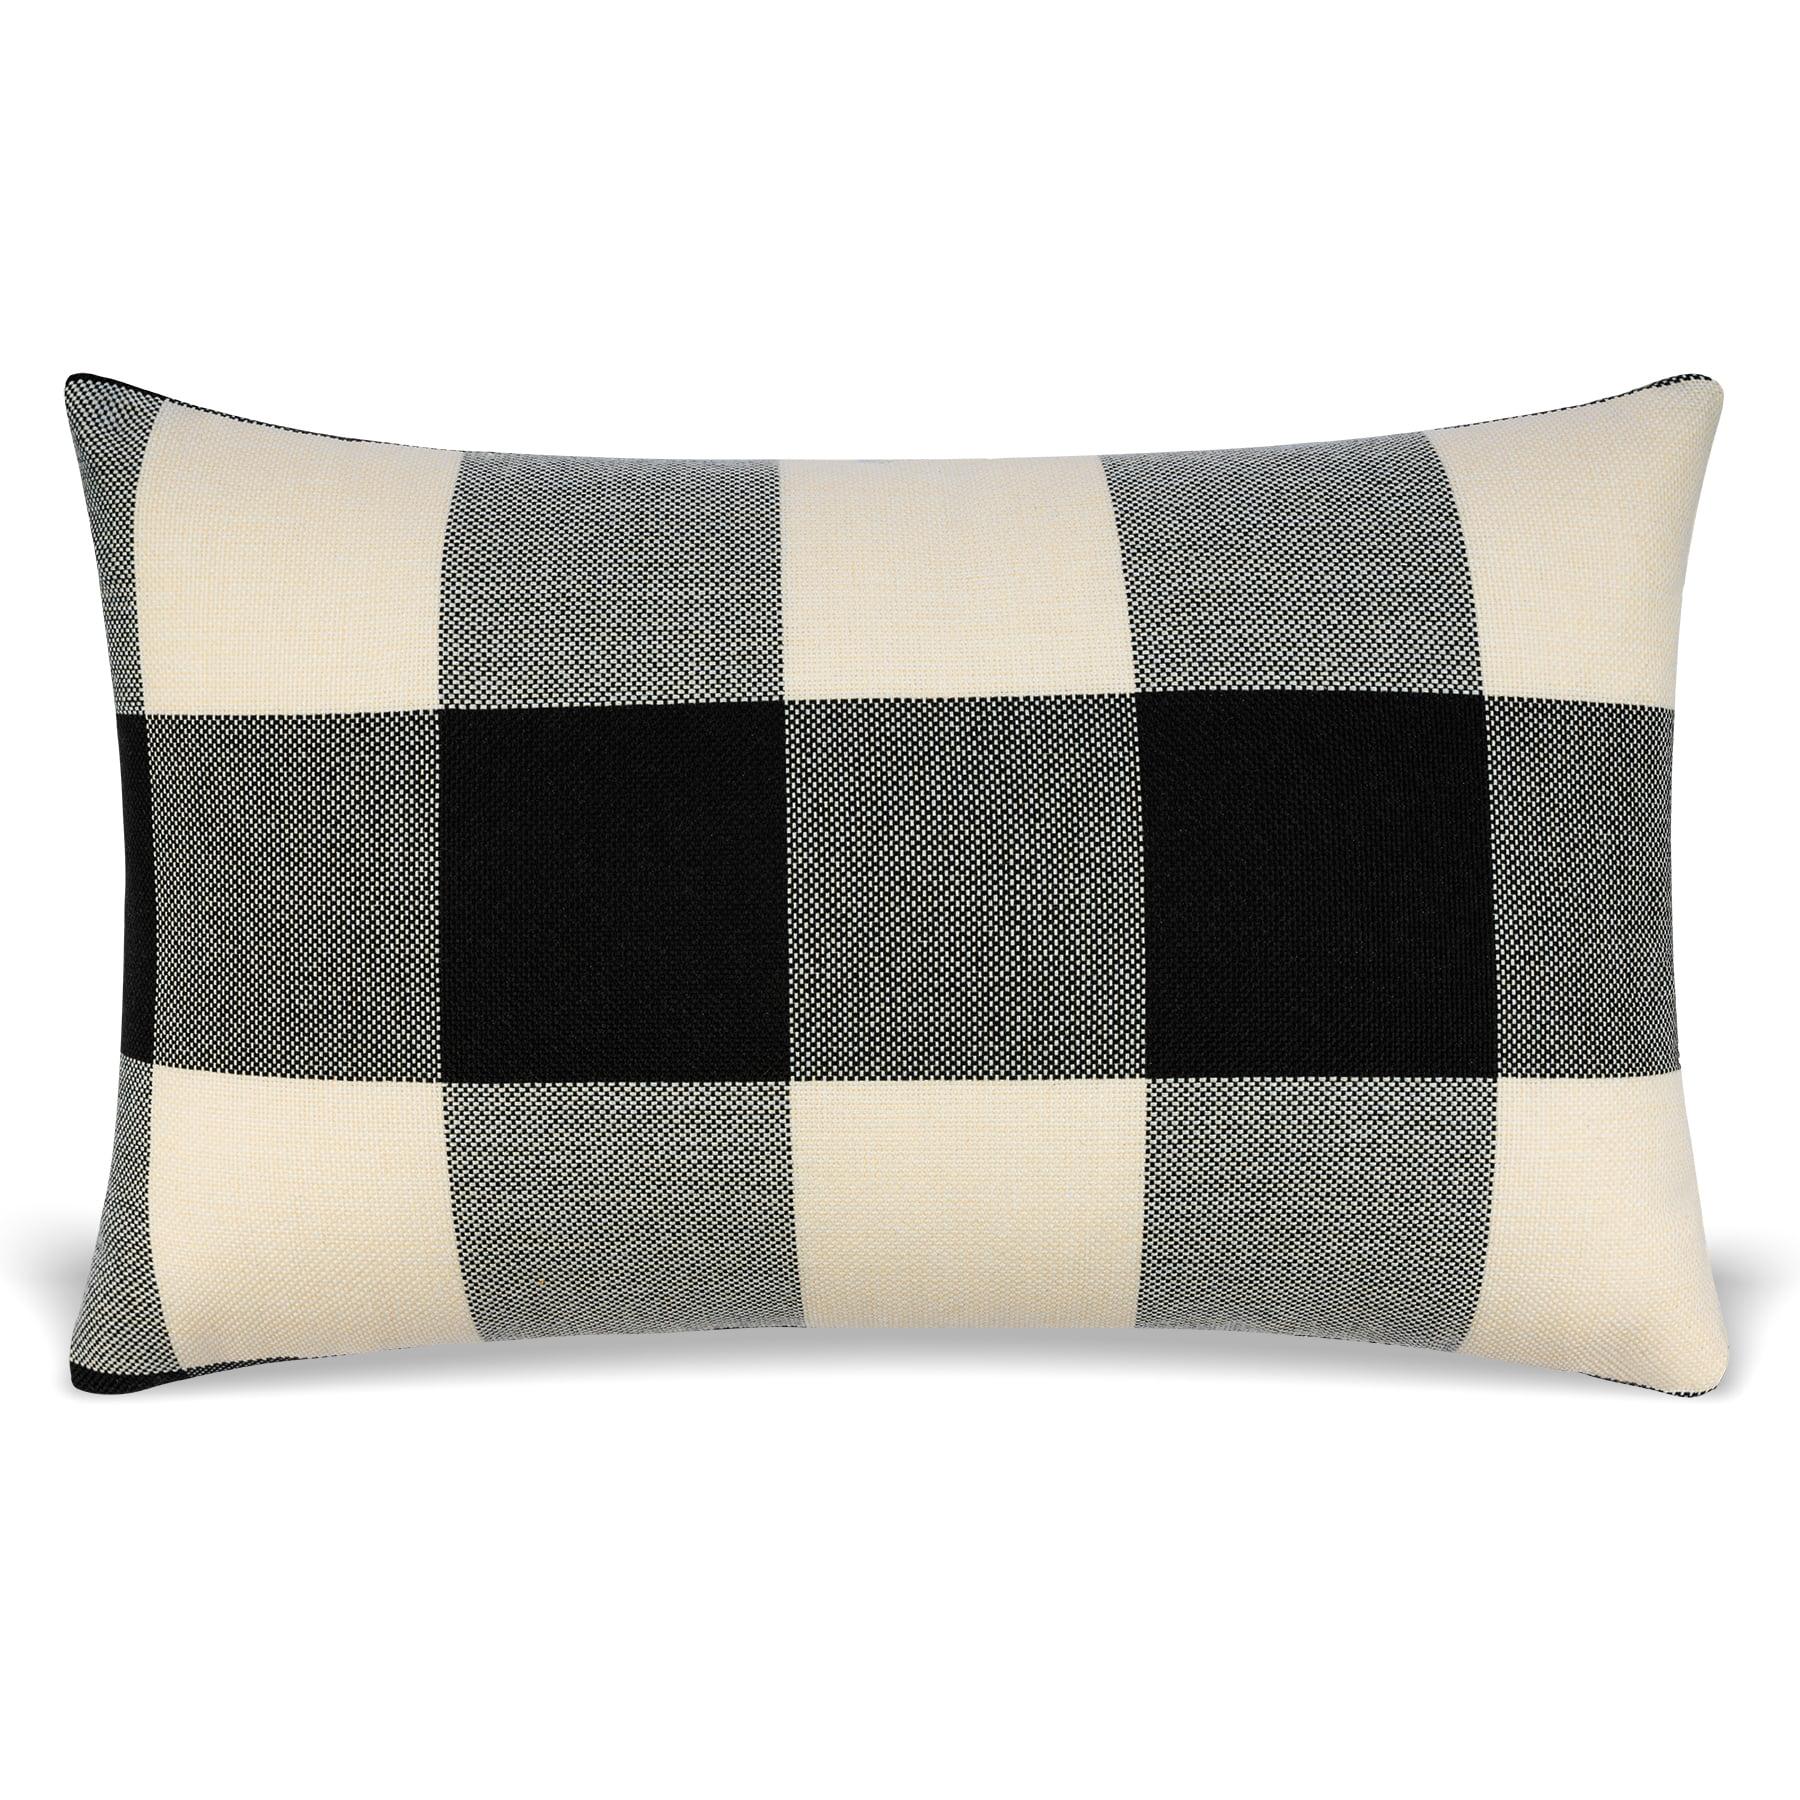 Mauby Home Decorative Pillows Modern Farmhouse Buffalo Plaid Lumbar Pillow Includes Pillow Insert Black And White Walmart Com Walmart Com